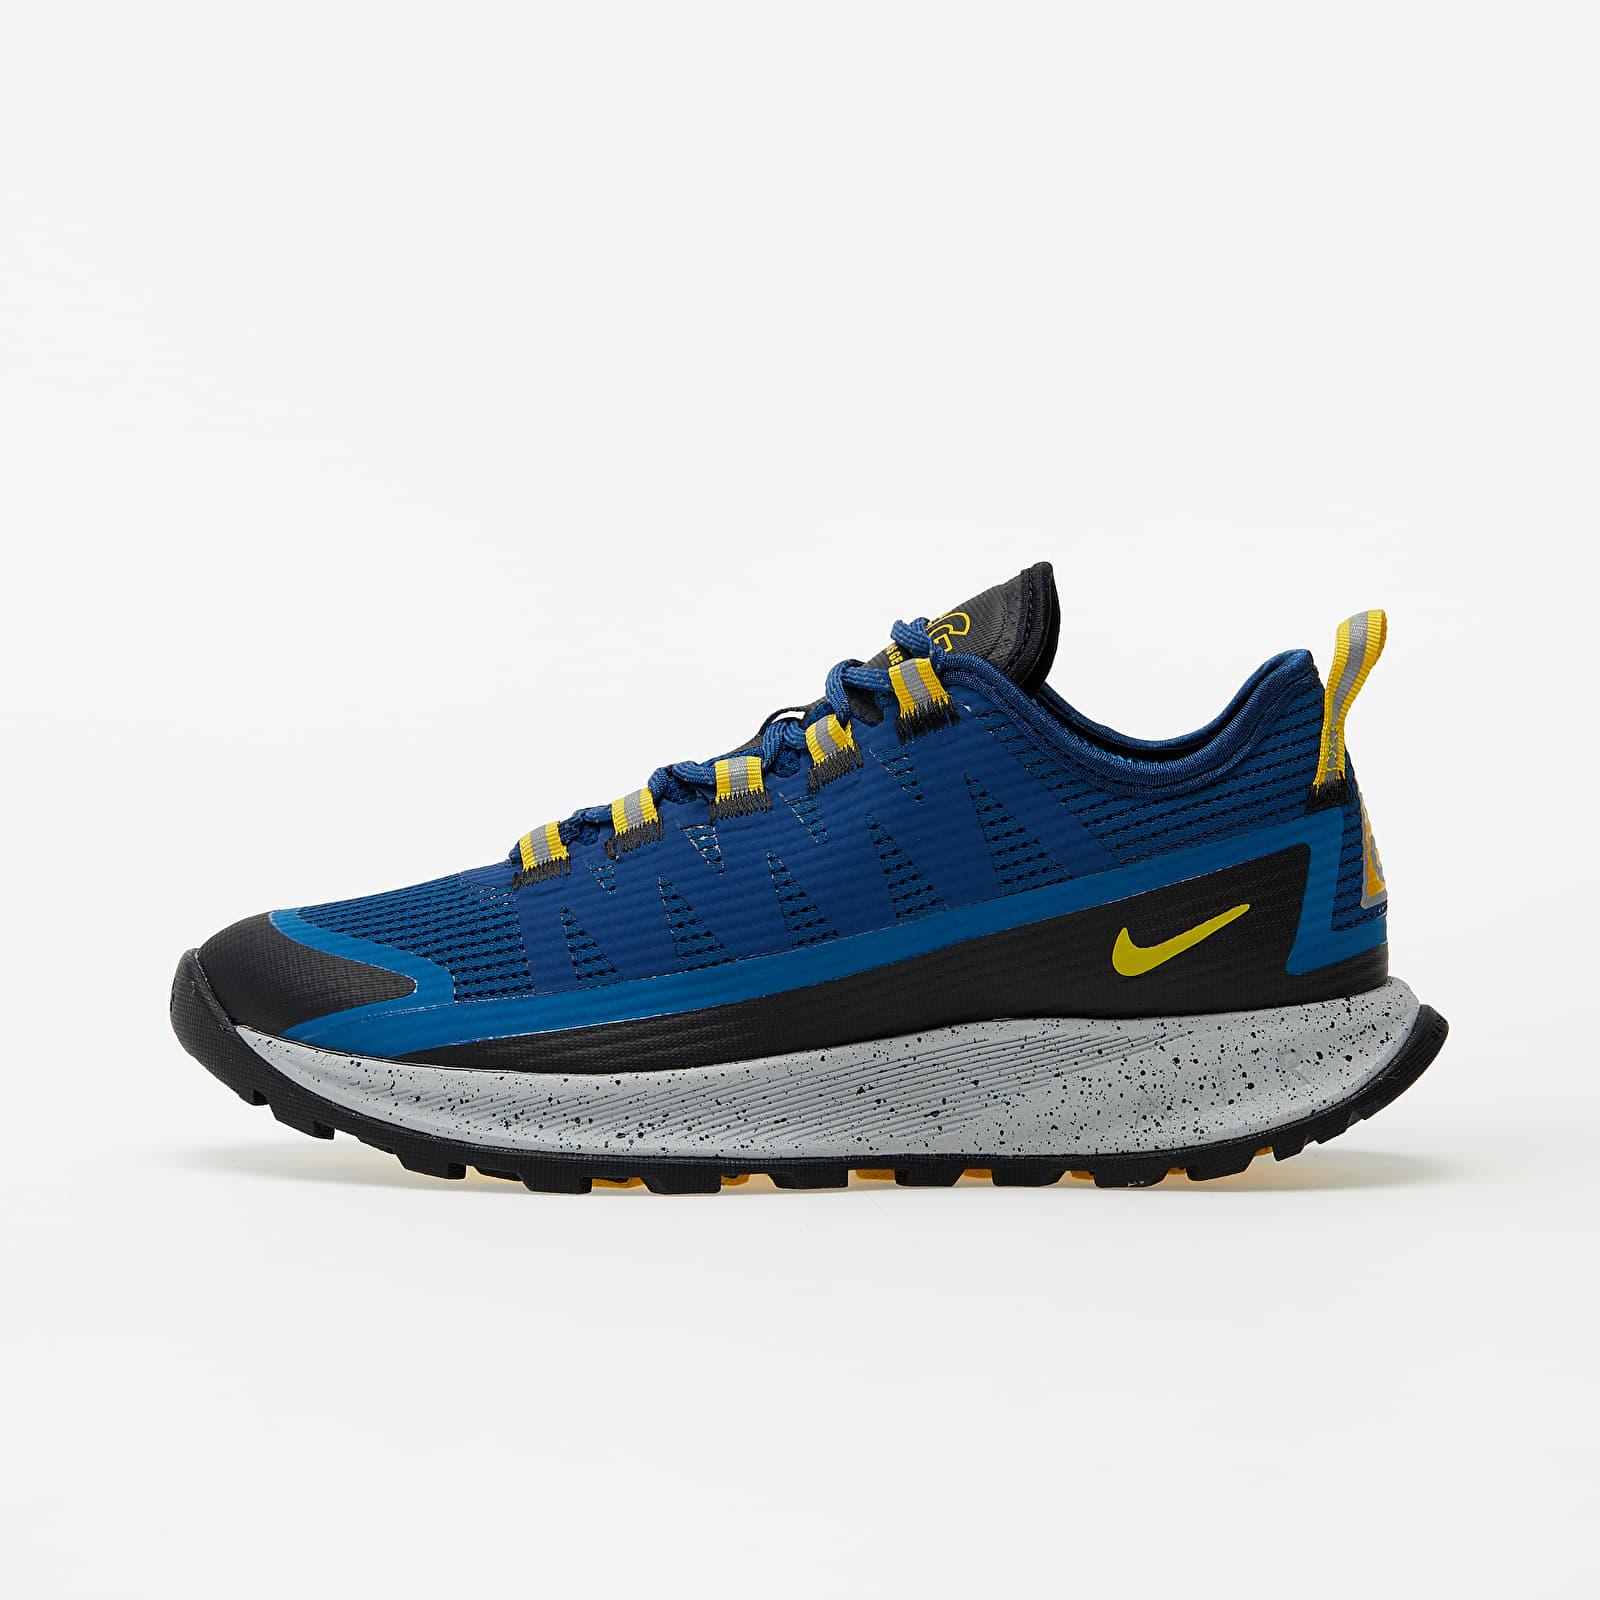 Männer Nike ACG Air Nasu Coastal Blue/ Vivid Sulfur